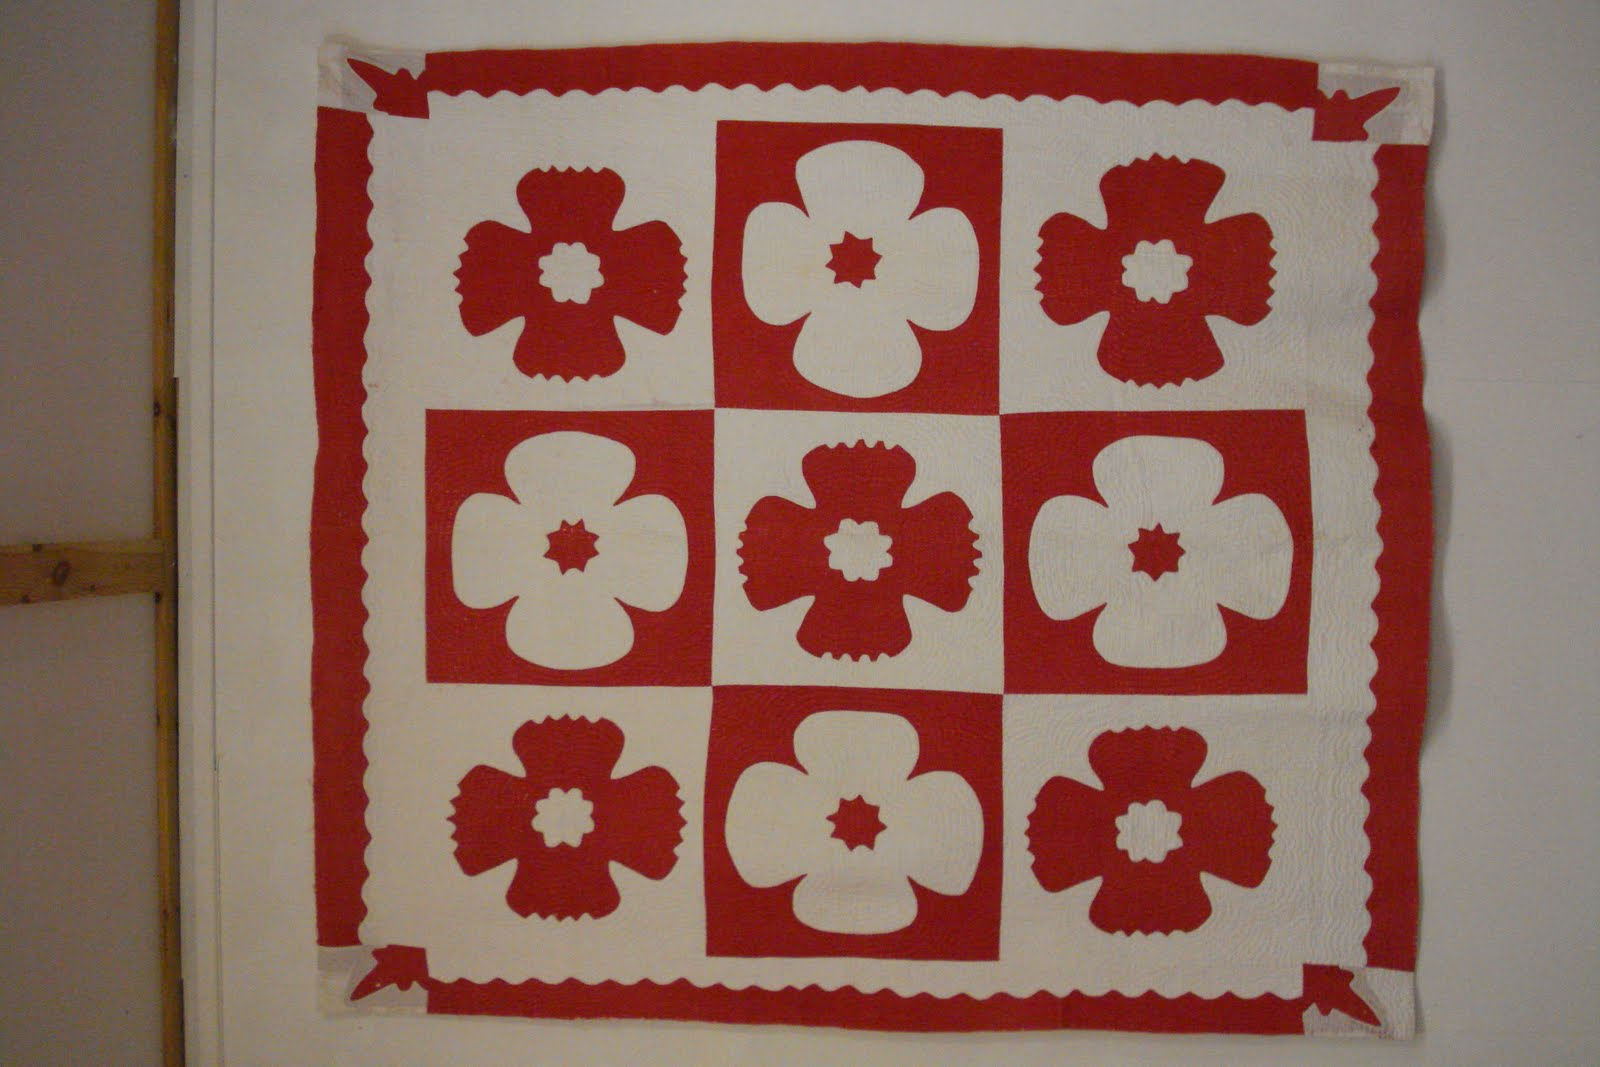 Applique designs for tablecloth - Dsc05482 Jpg